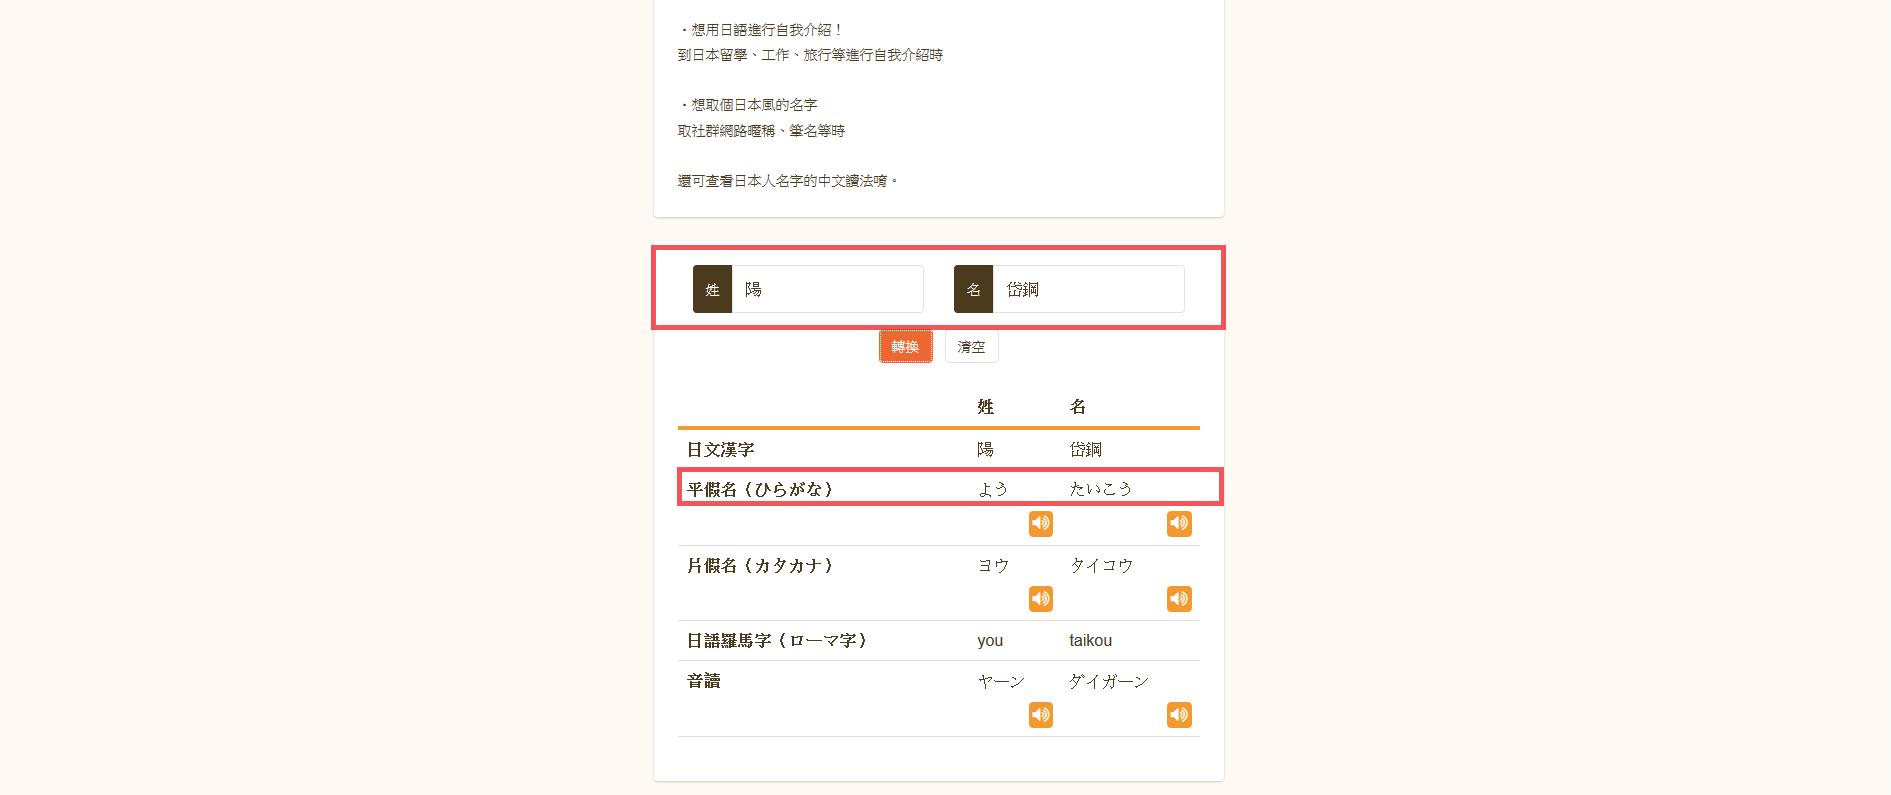 namechange result